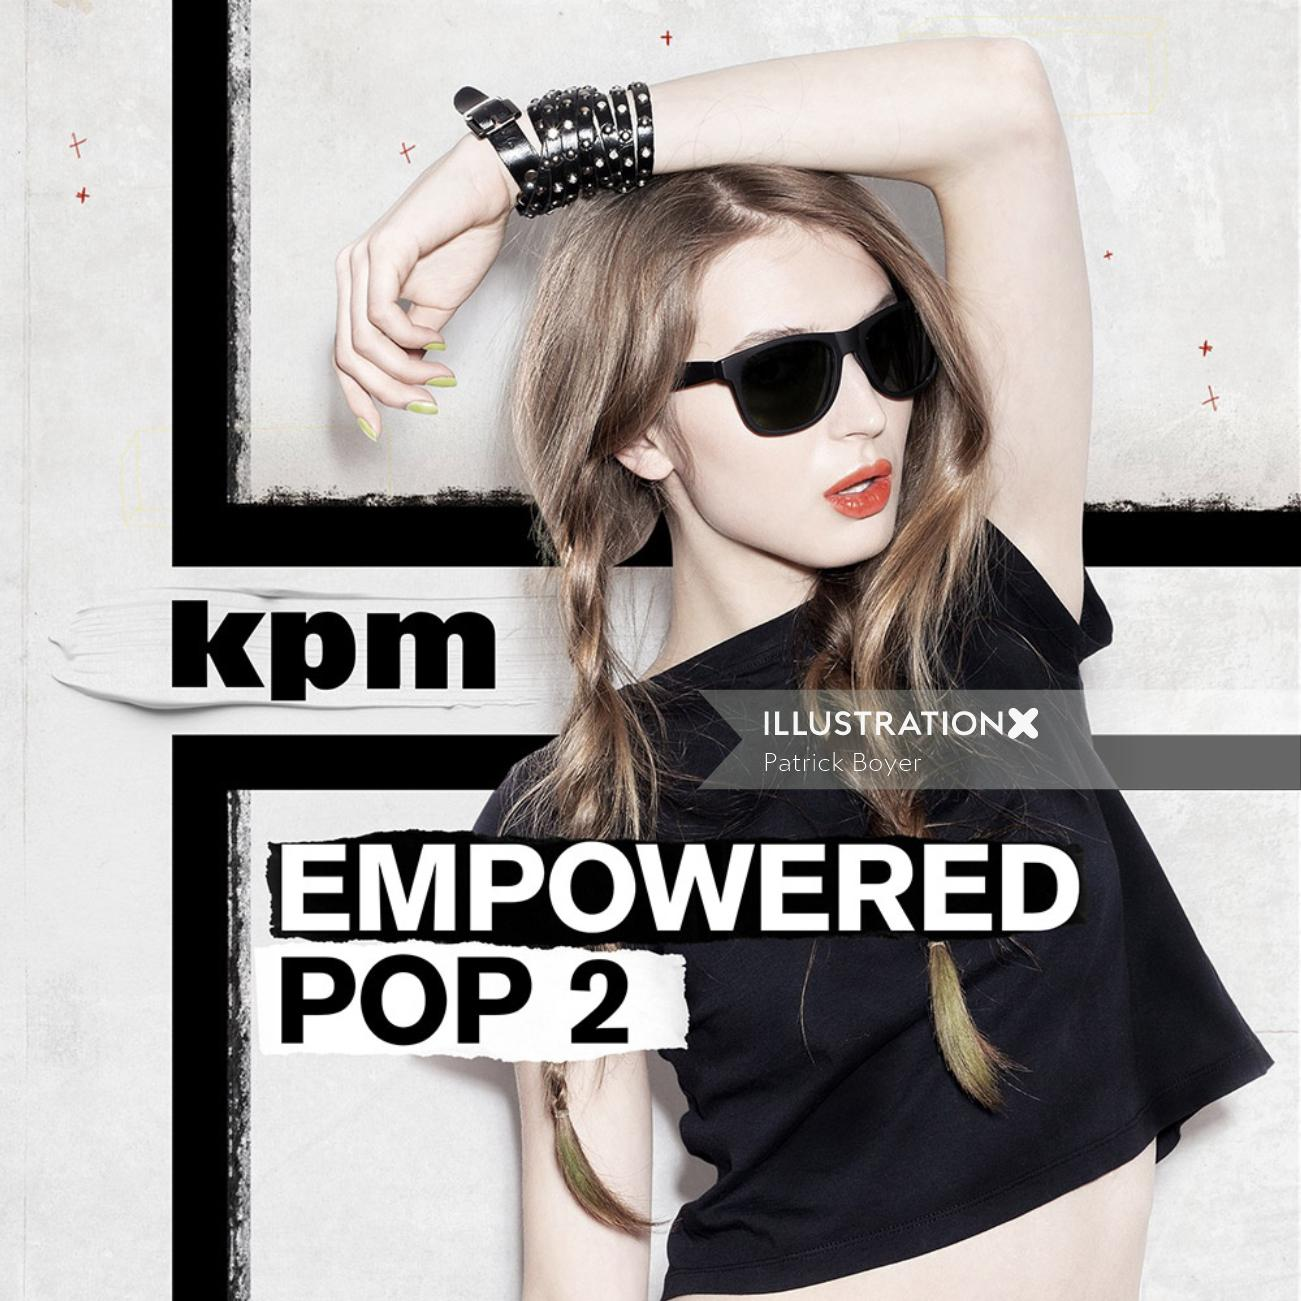 Album cover of empowered pop 2